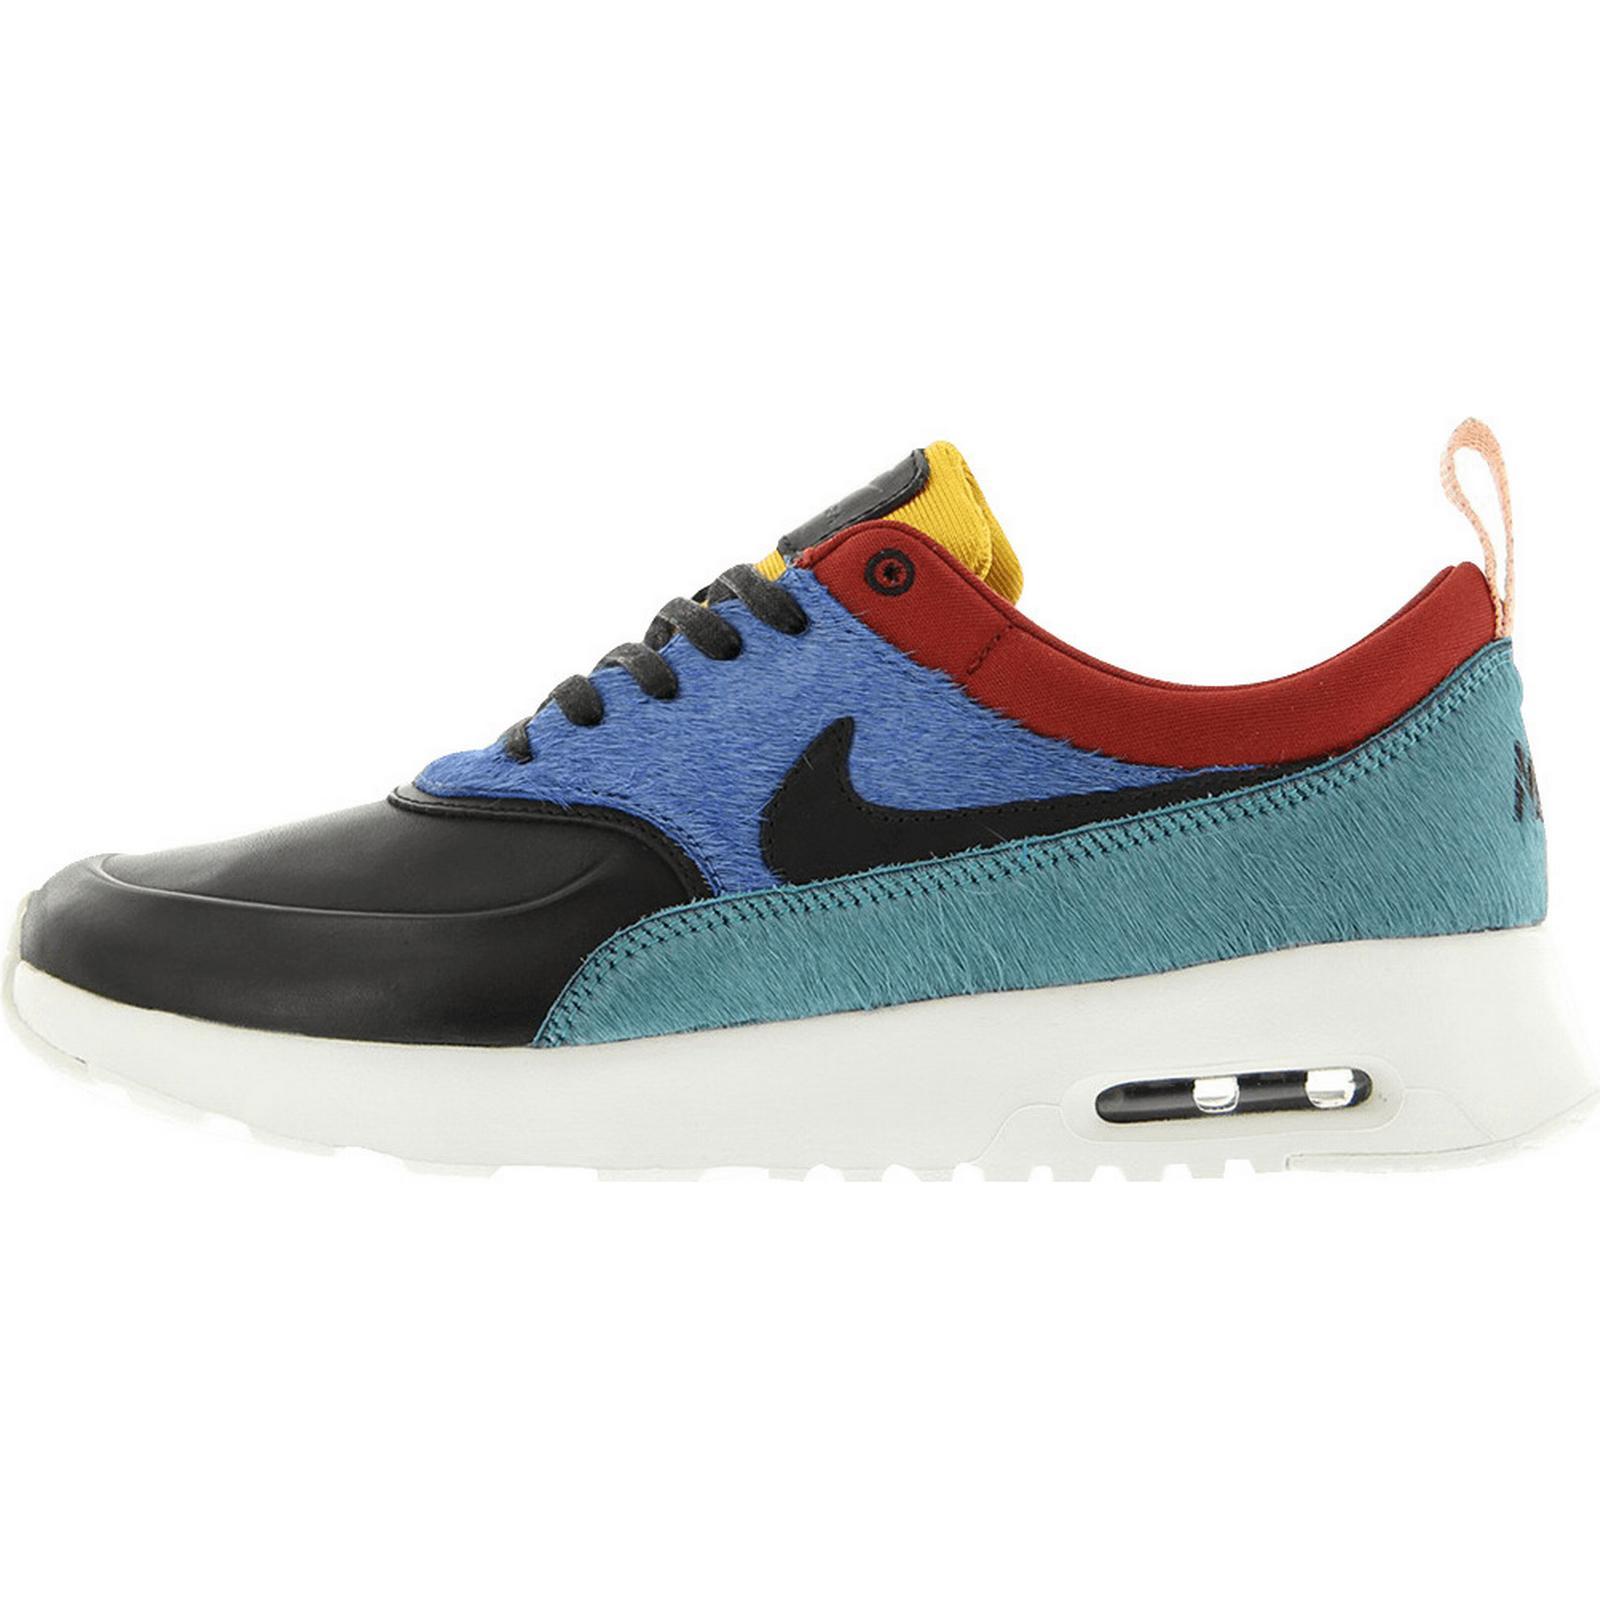 Nike Max Air Max Nike Thea Premium - Multicolor 368135